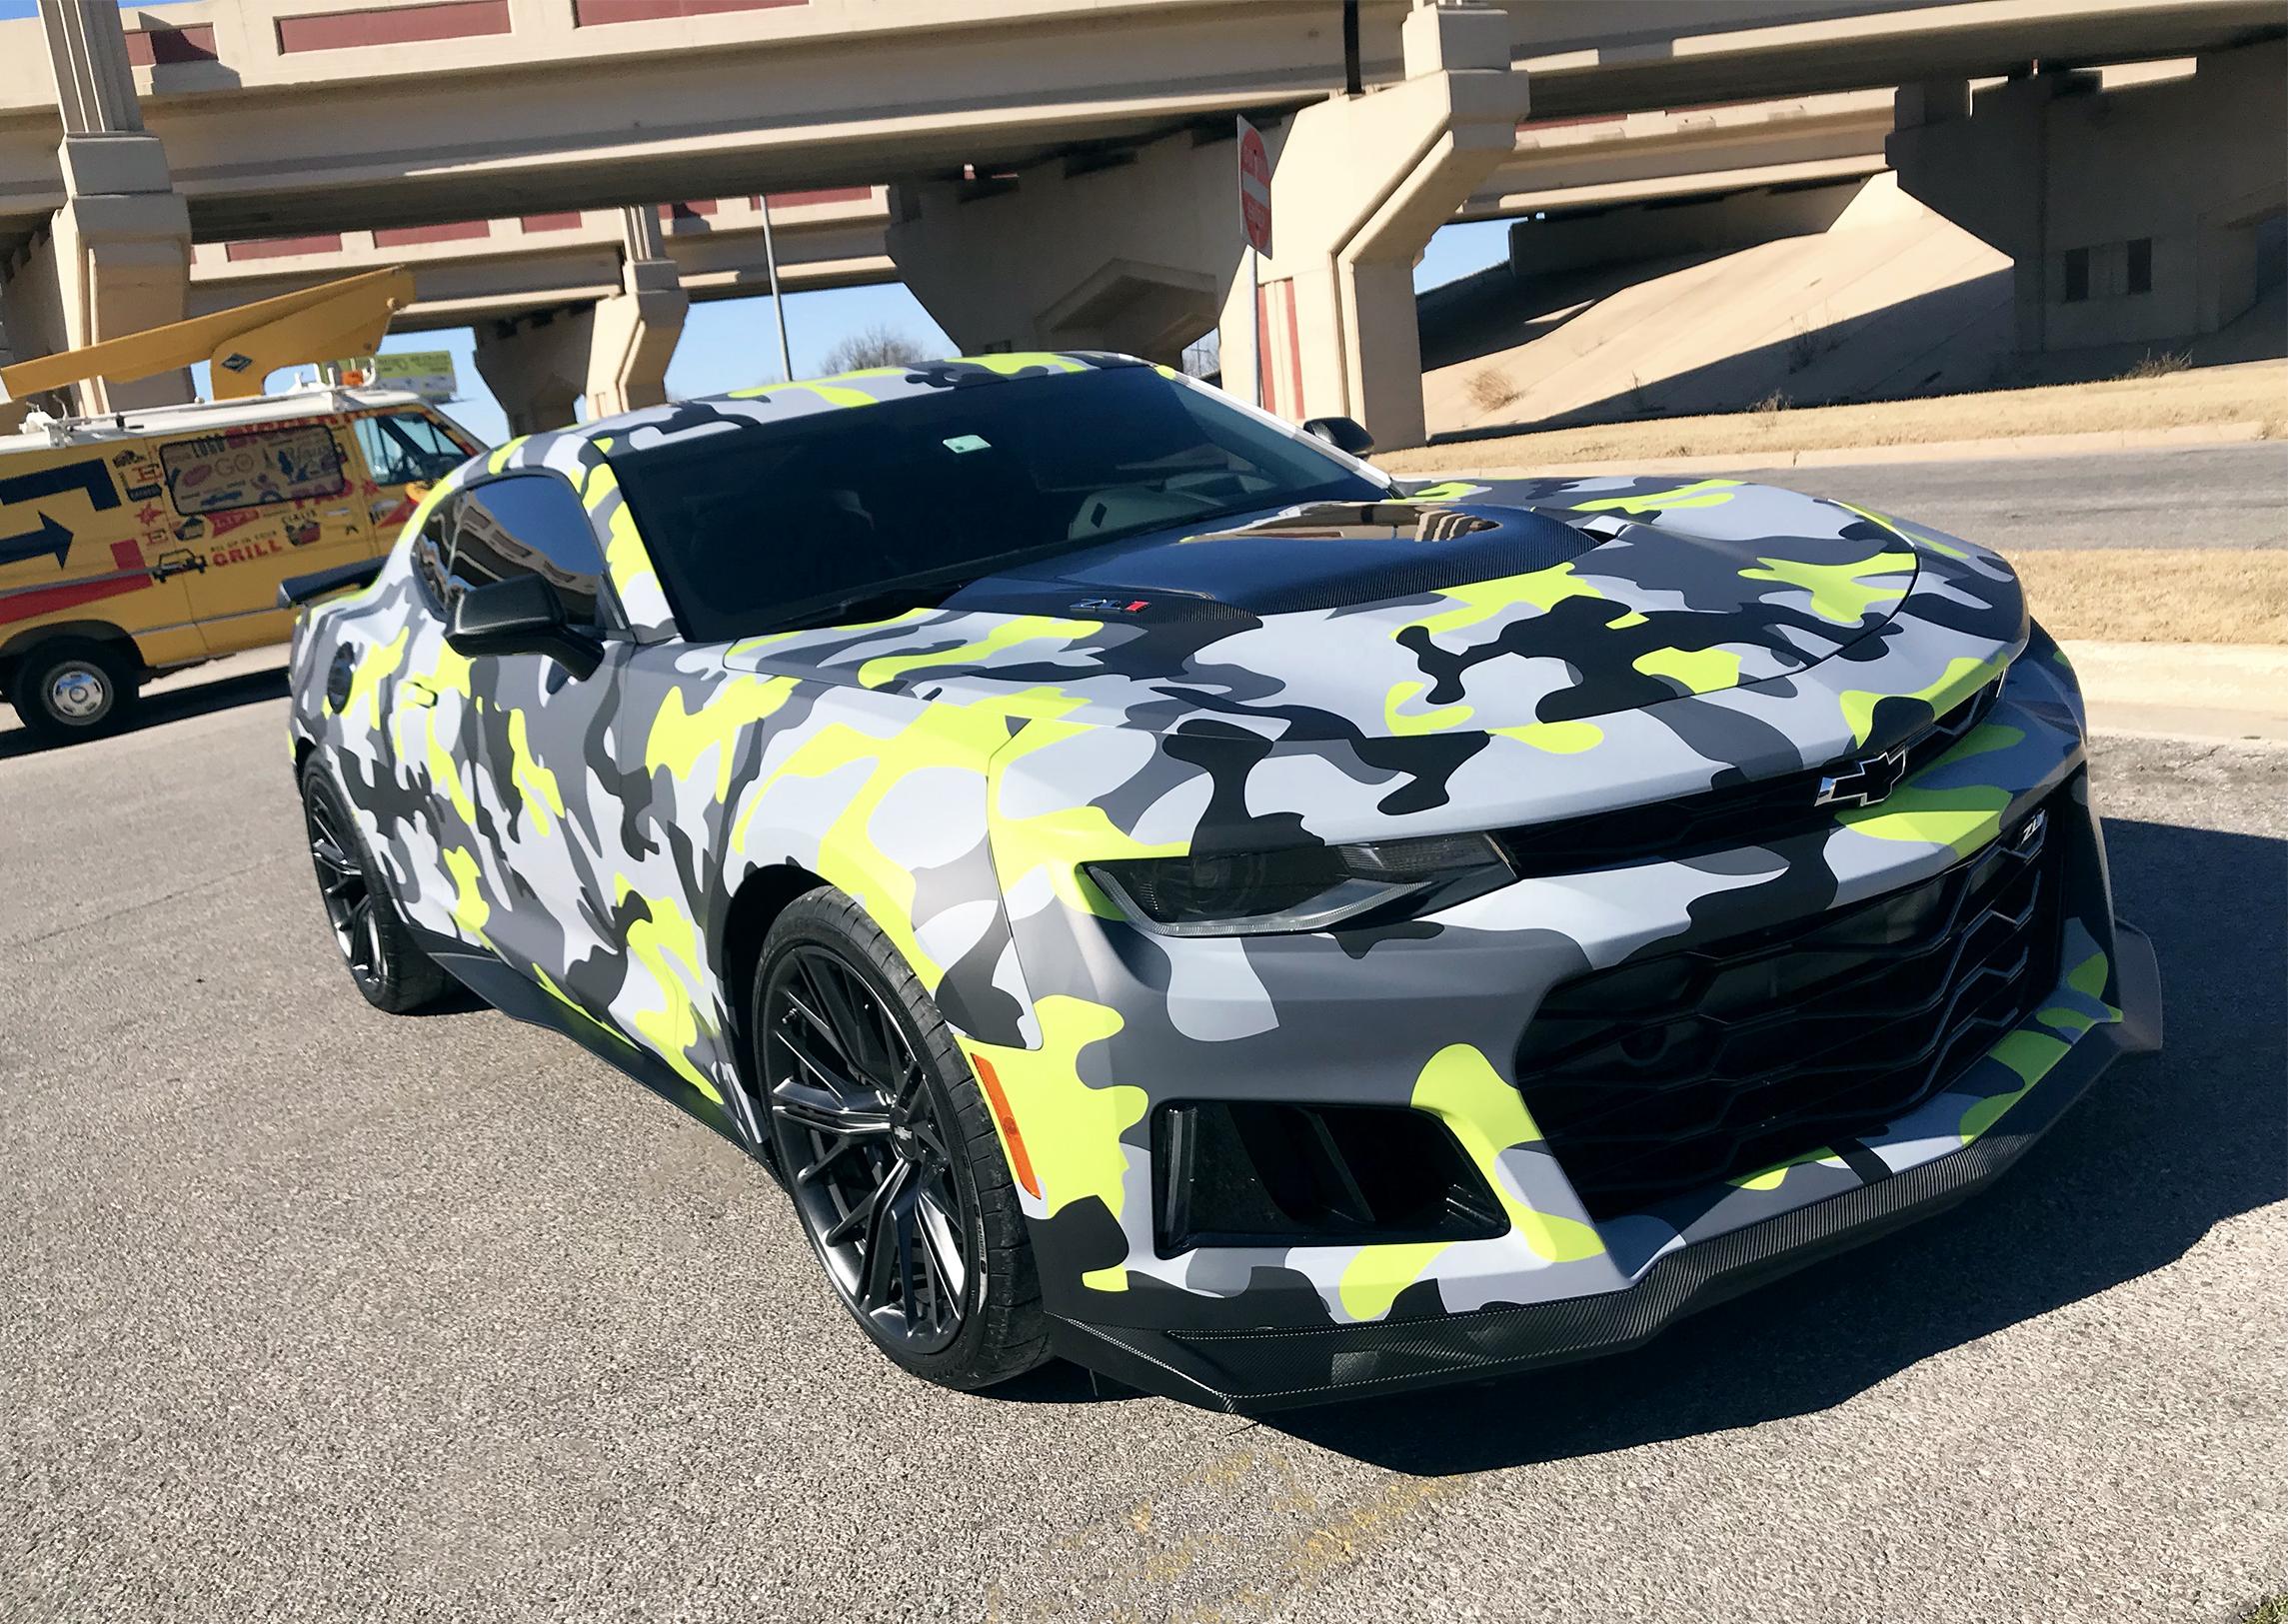 Camaro_digital print wrap_Avery Dennison_carbon fiber accents.jpg